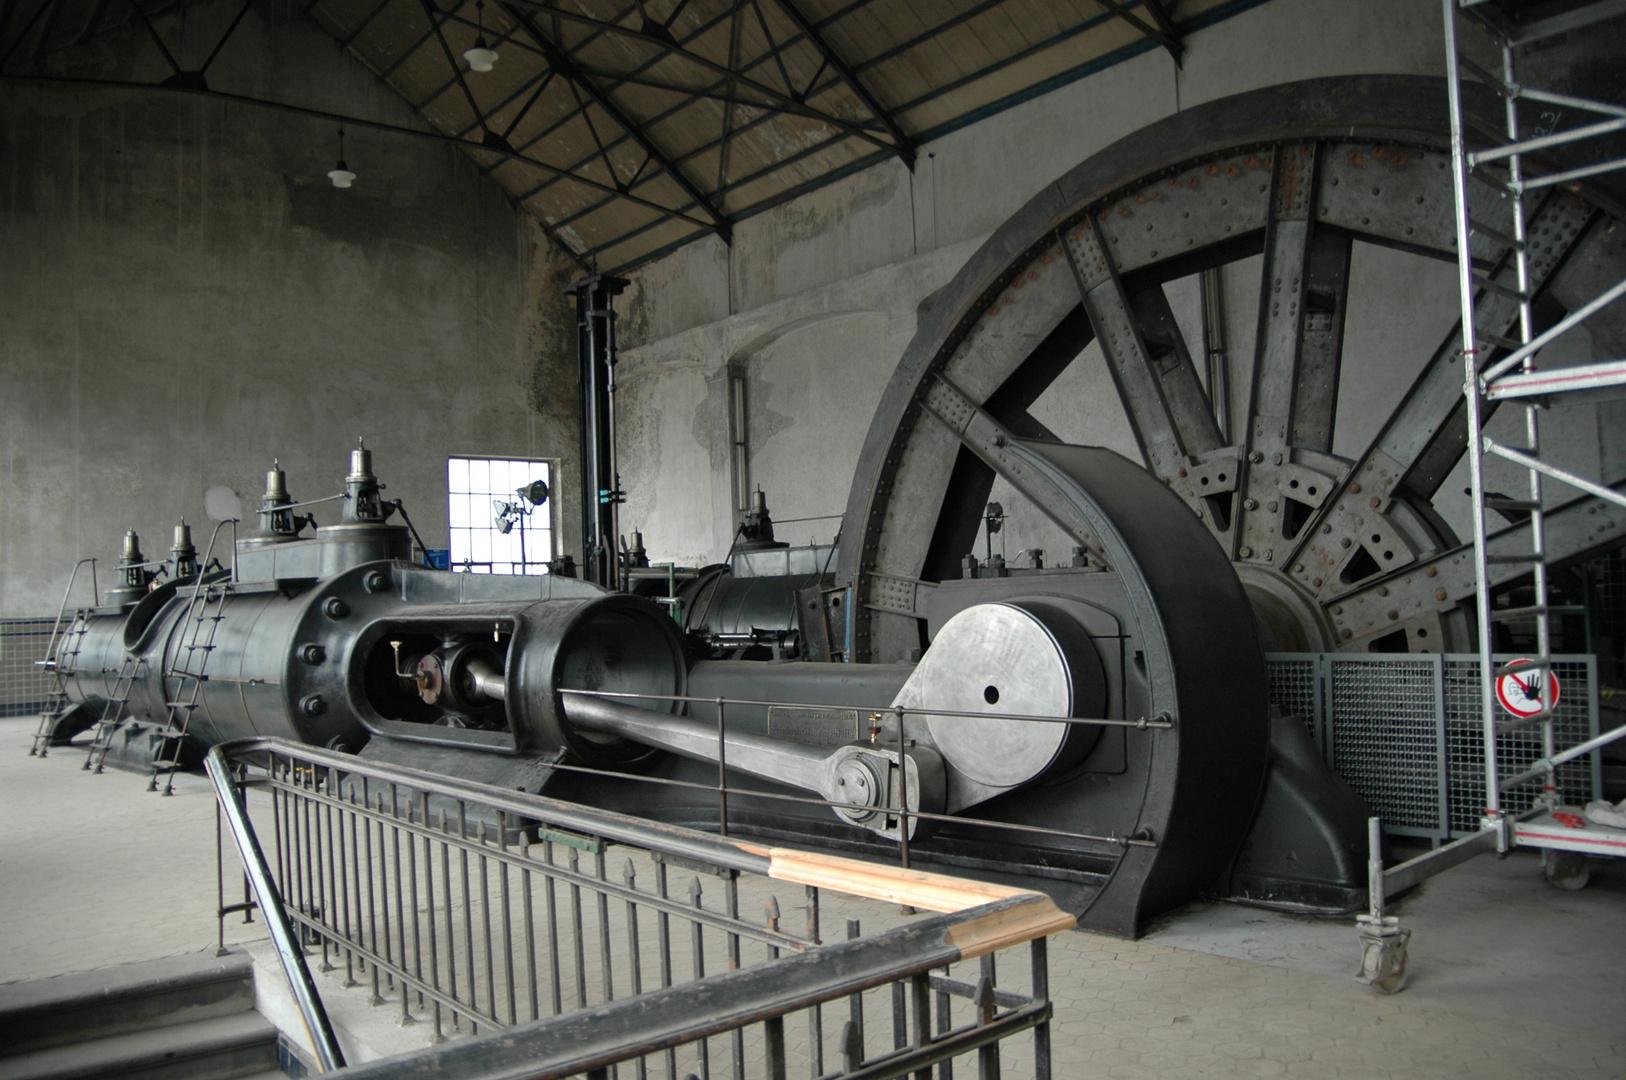 Mächtige Maschine